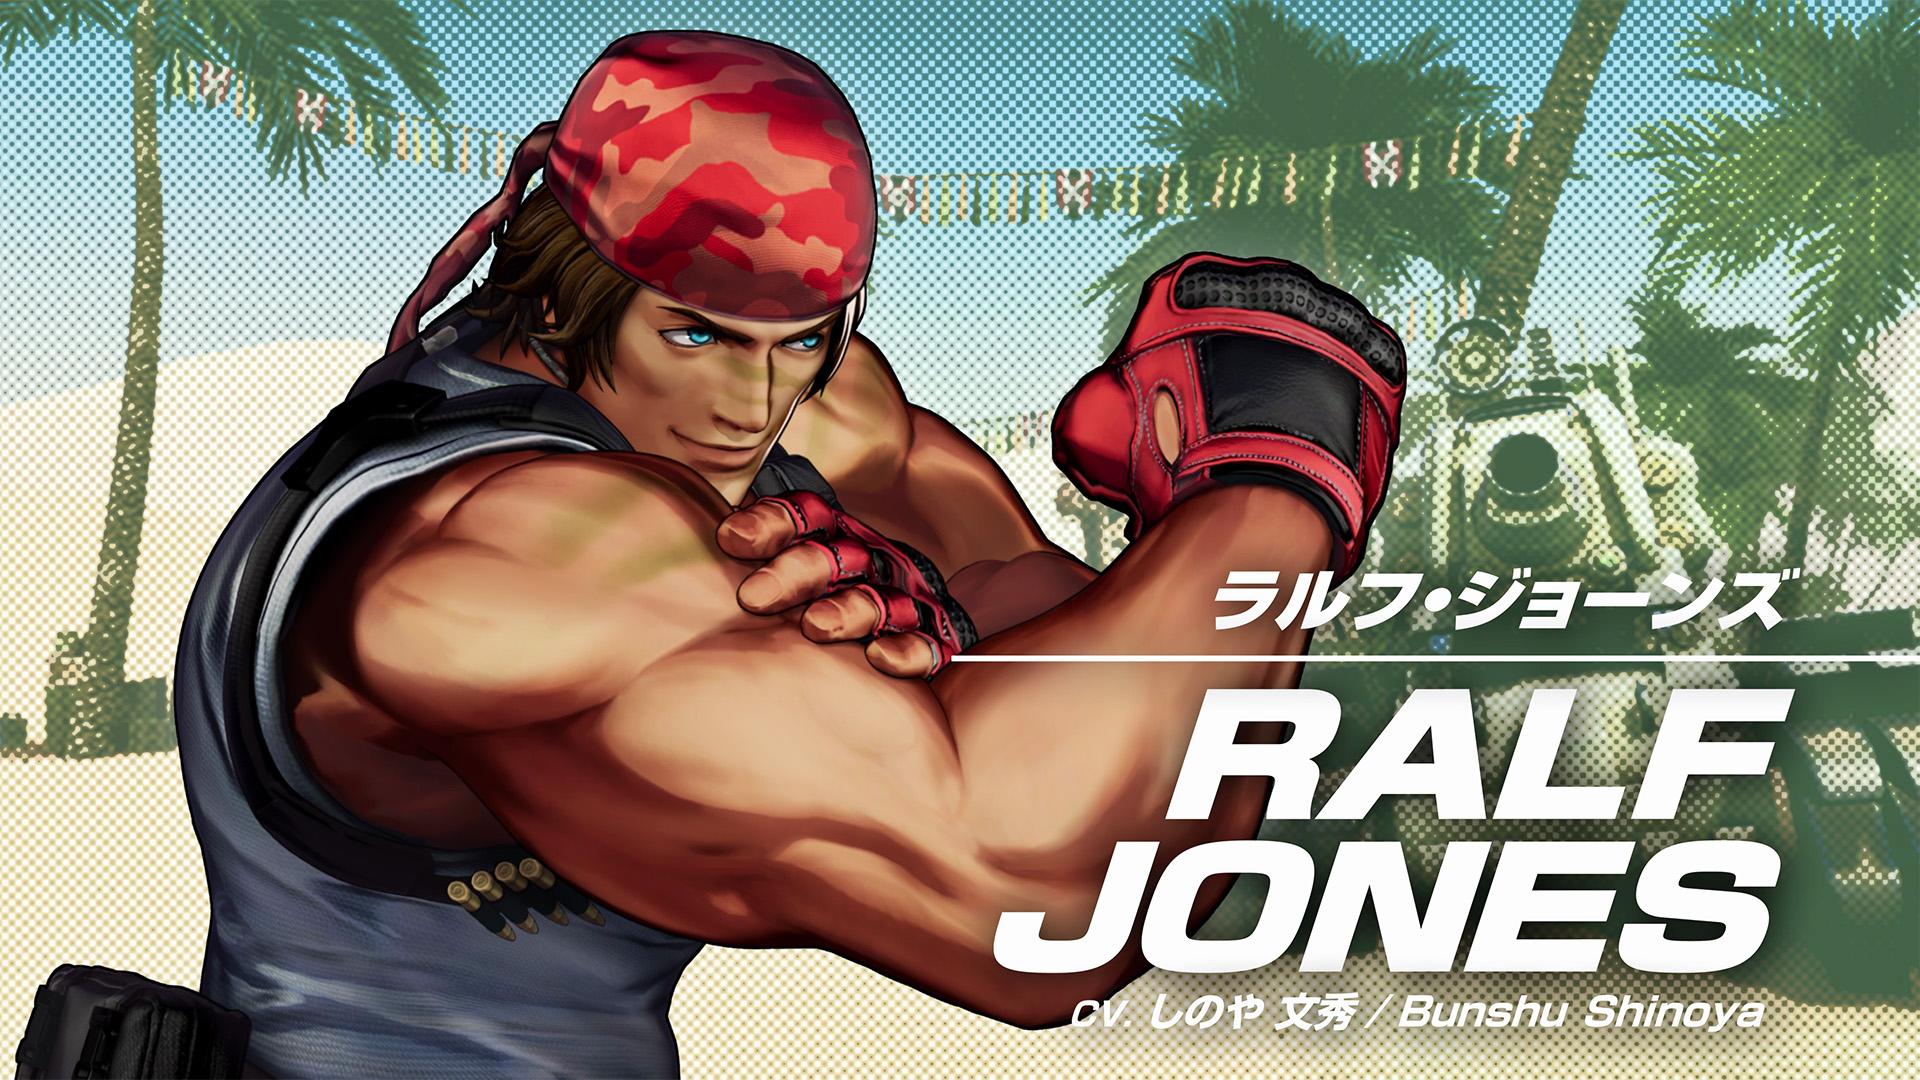 The King of Fighters XV Ralf Jones